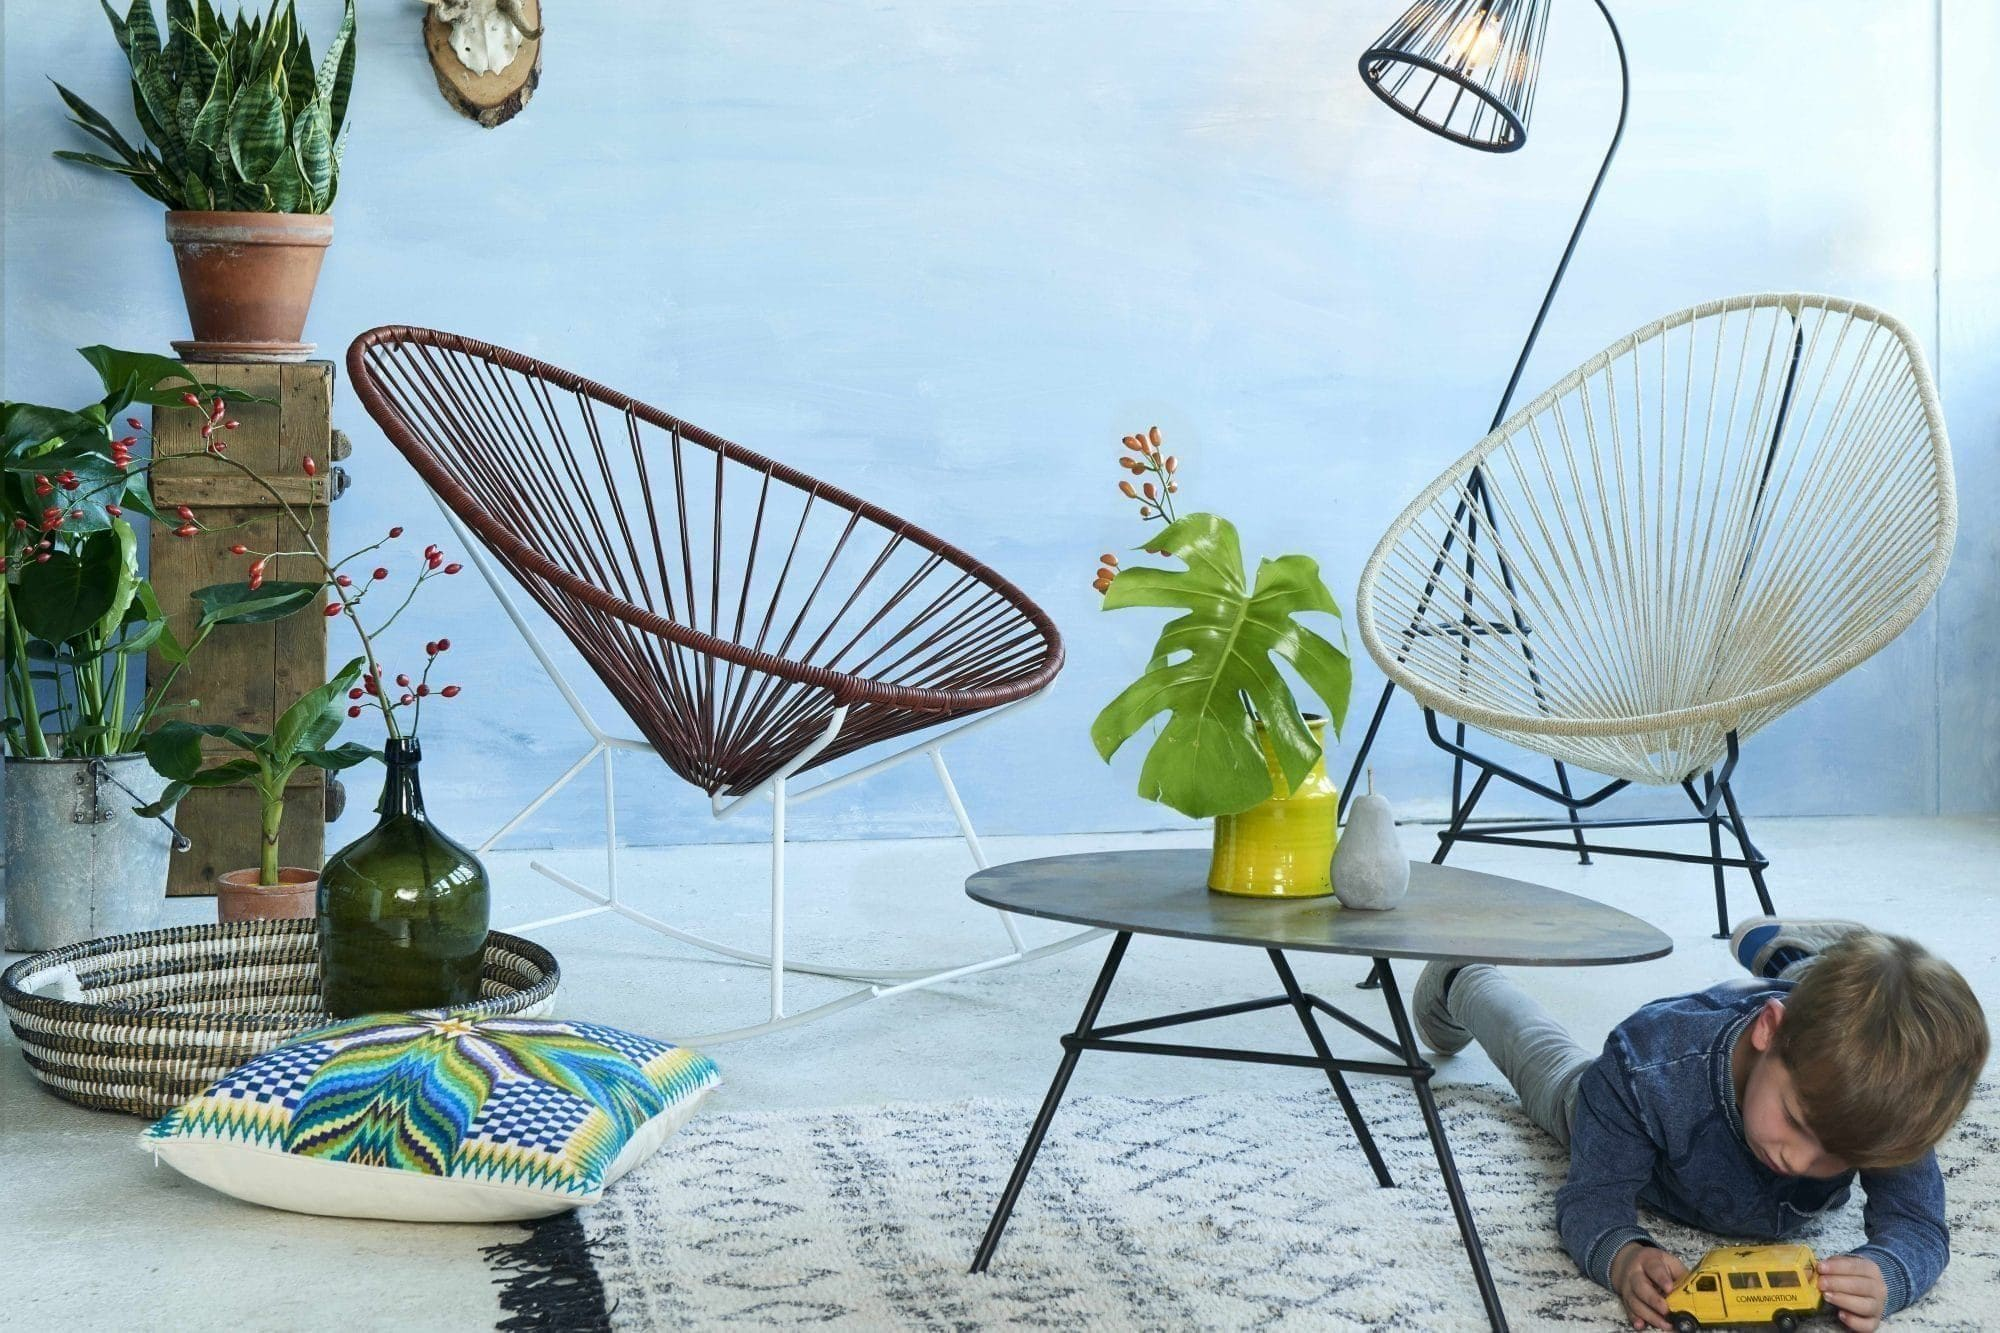 free fair furniture rocking chair photo shoot with sedia acapulco